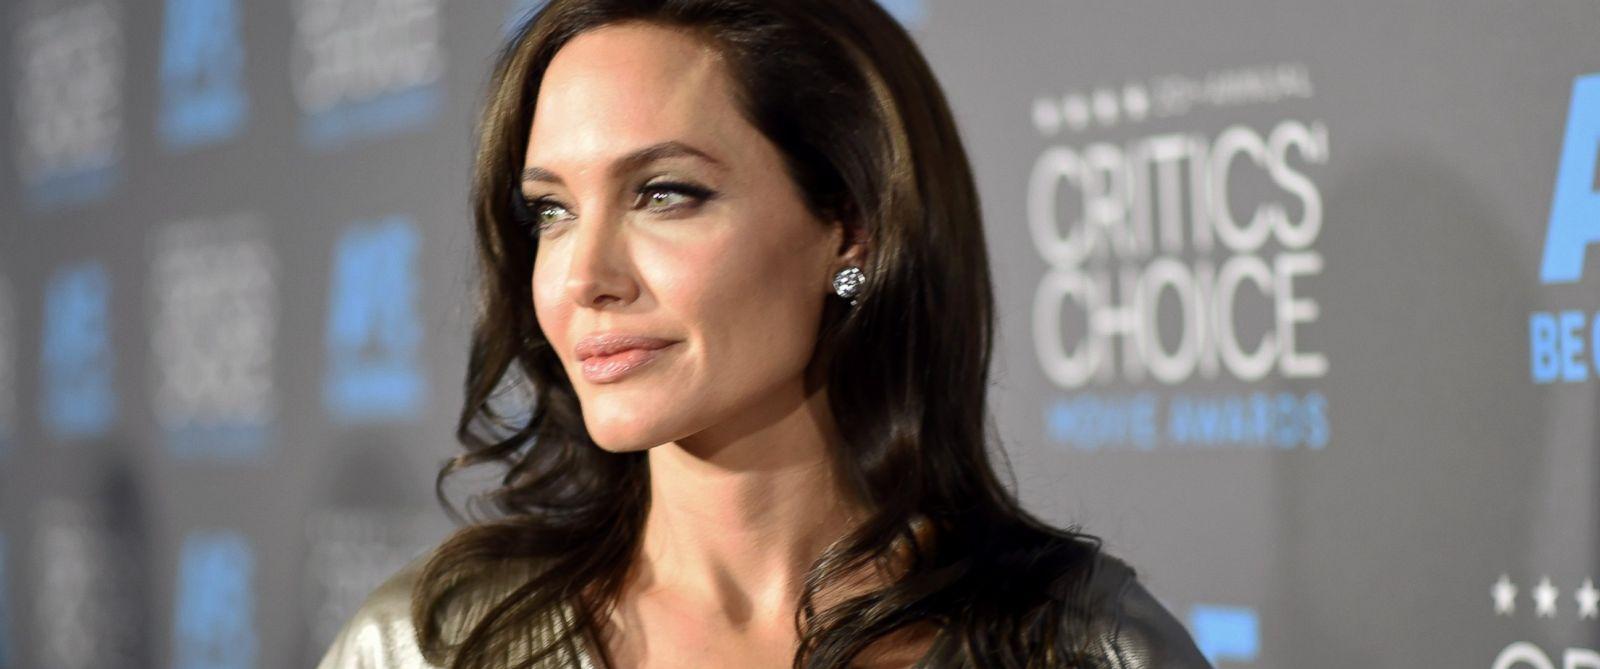 Angelina Jolie Loves Being in Menopause - ABC News Angelina Jolie